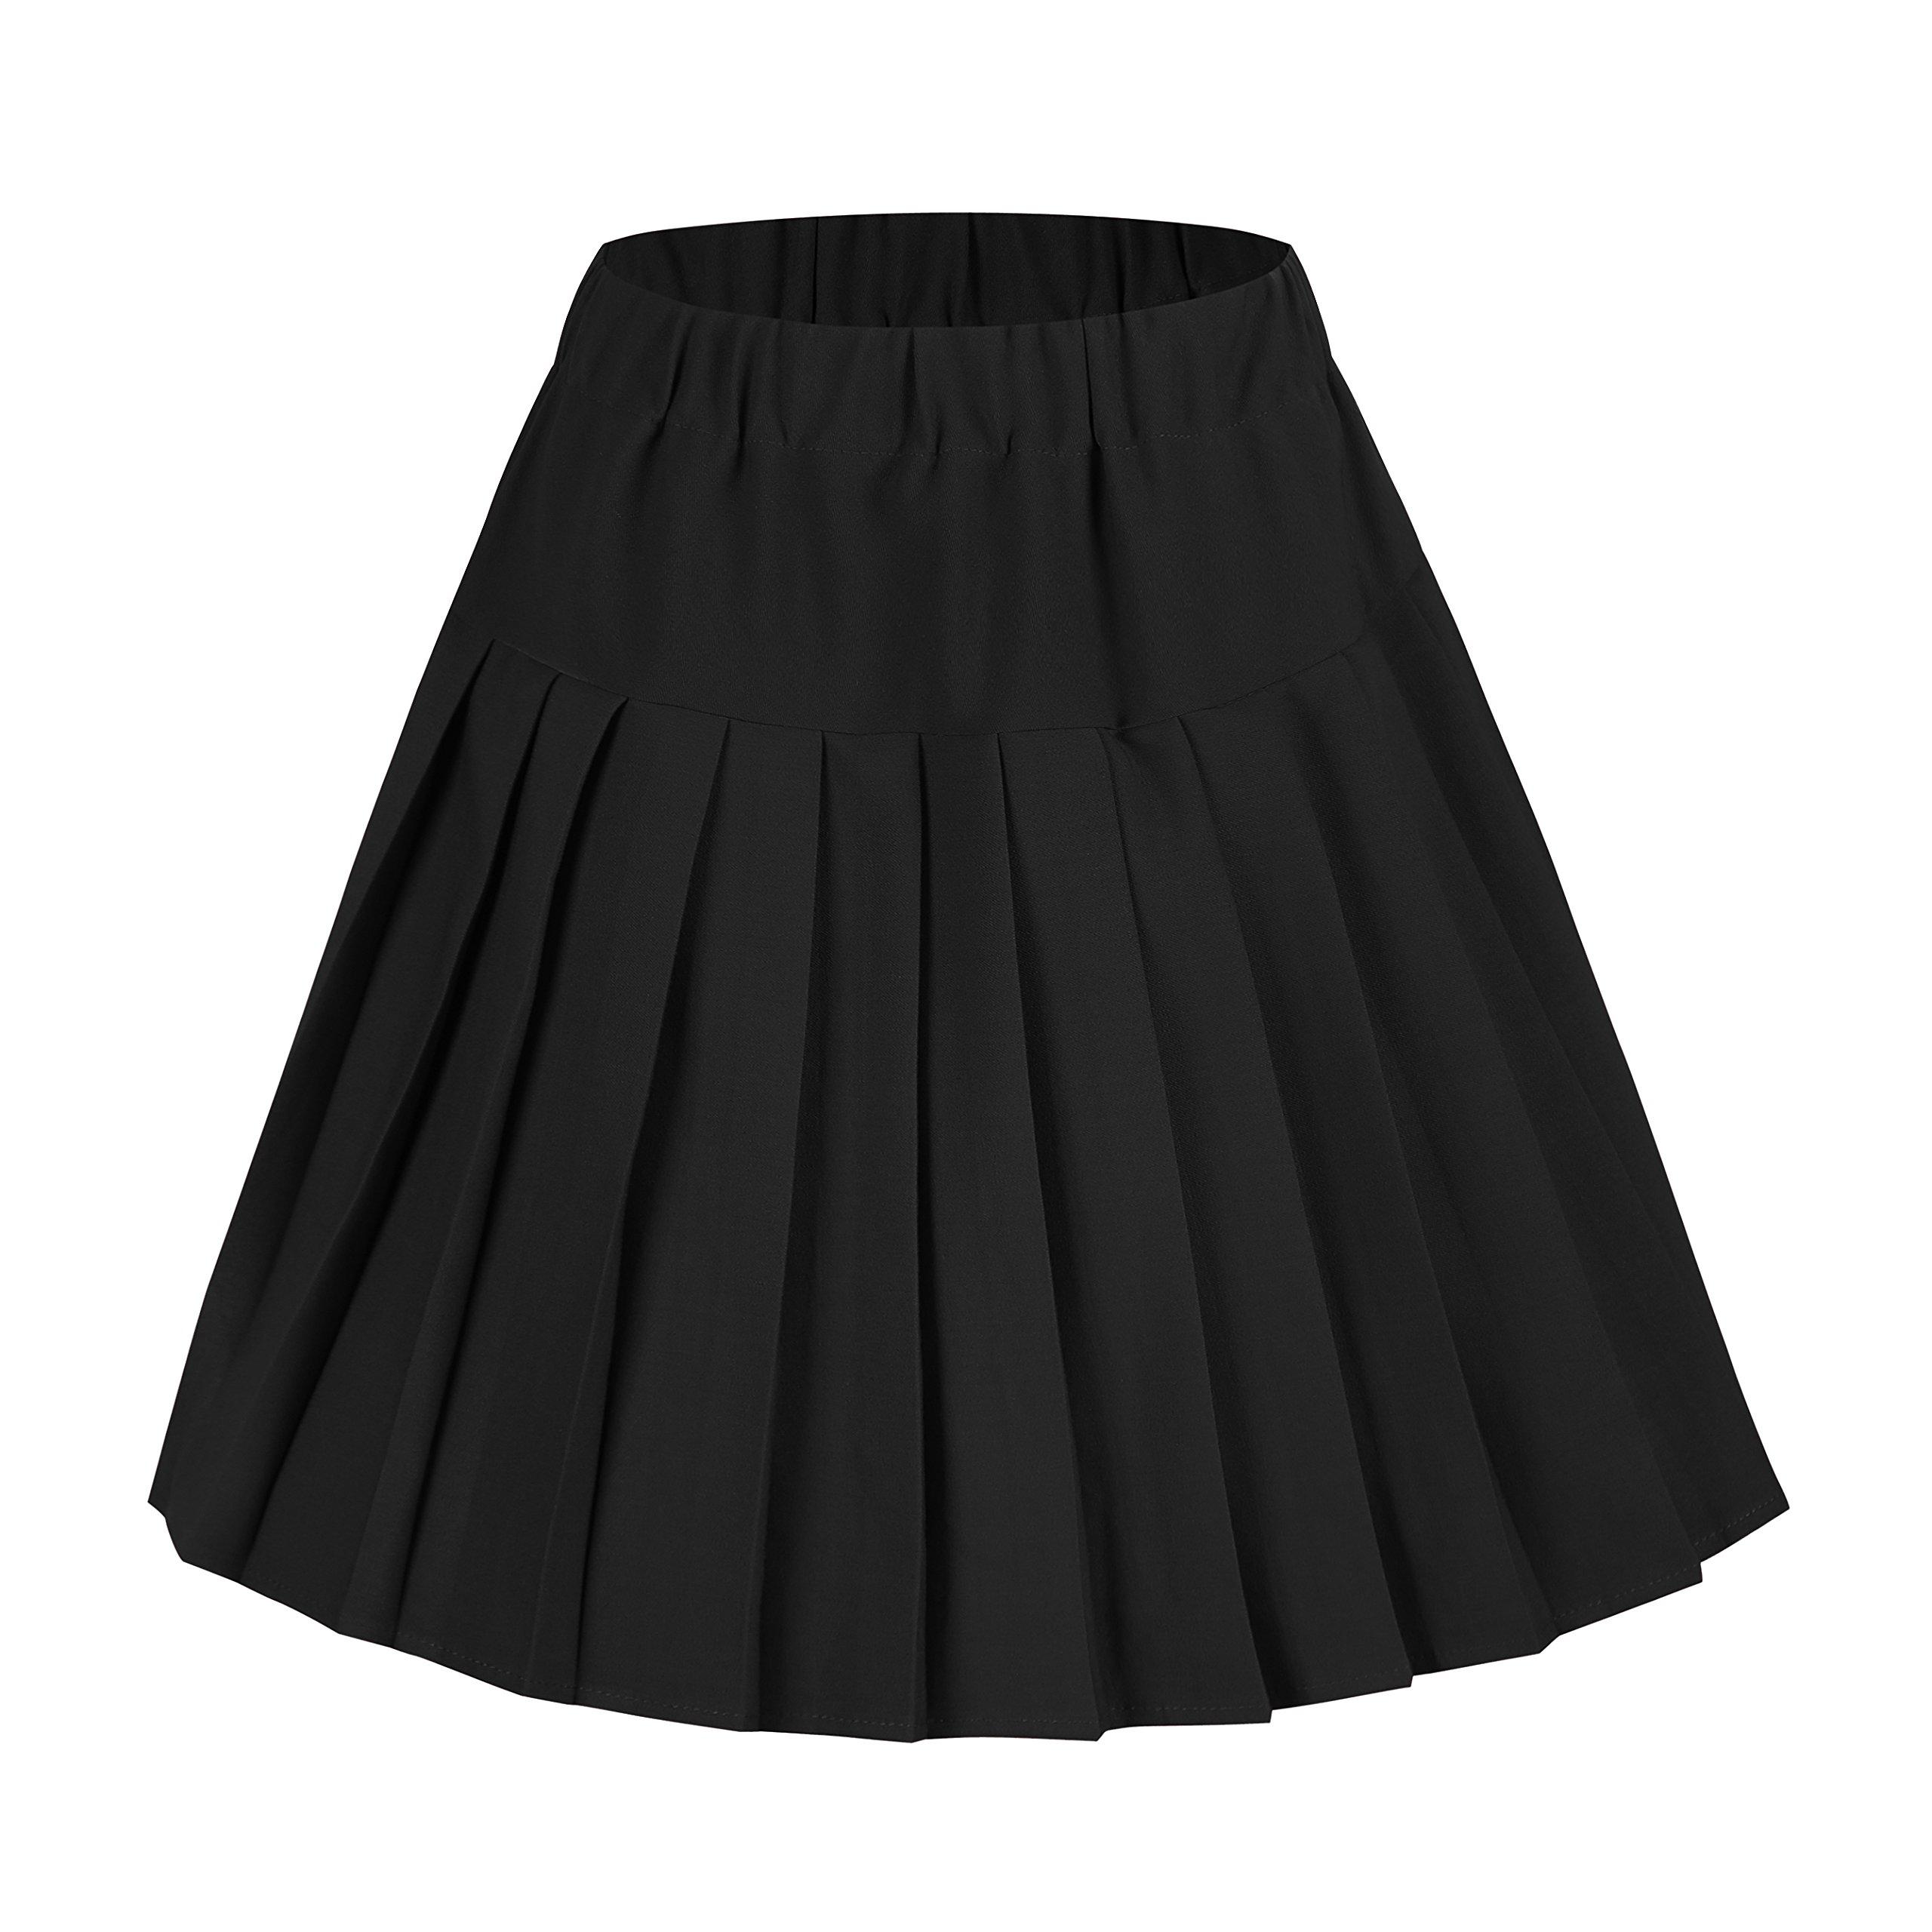 Urban CoCo Women's Elastic Waist Tartan Pleated School Skirt (X-Large, Solid Balck)